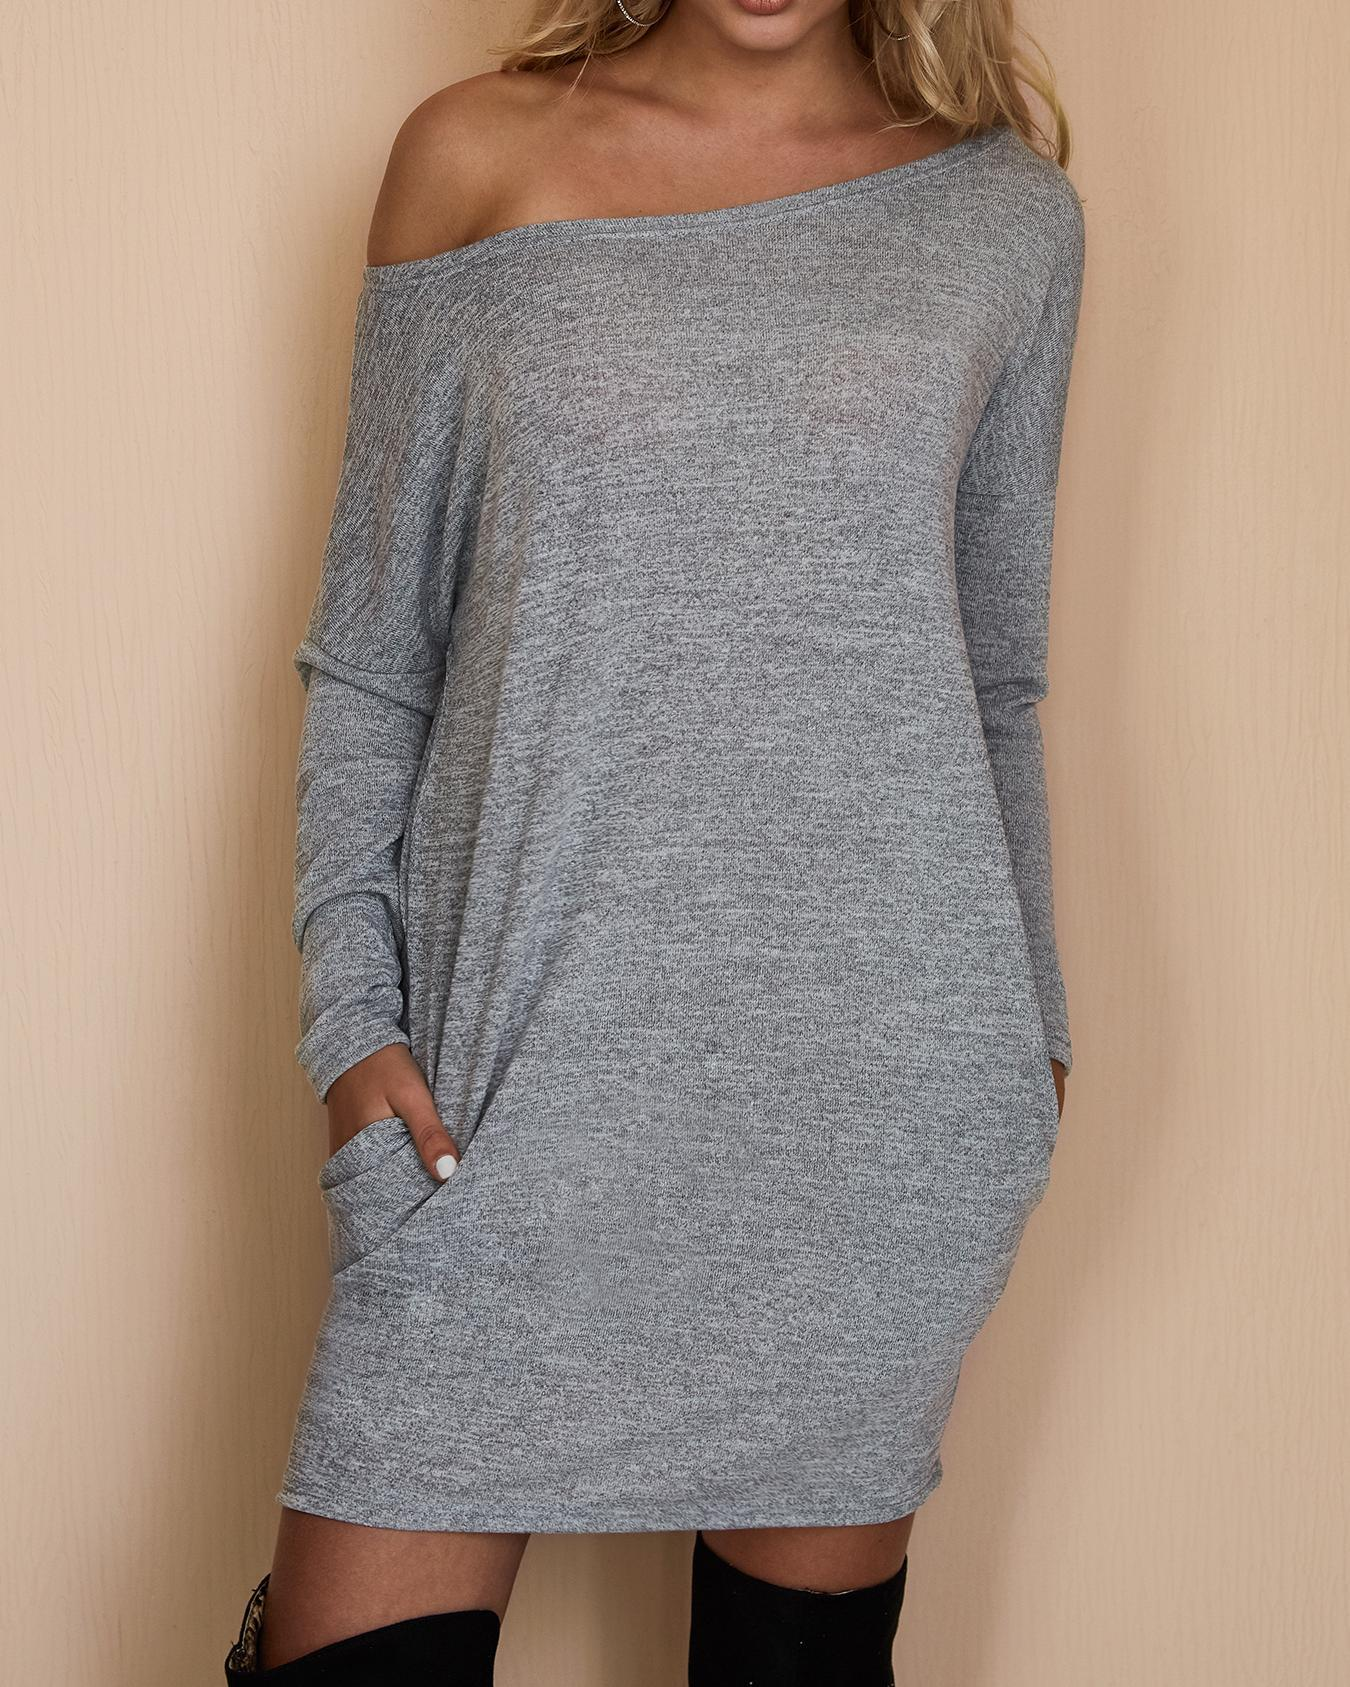 chicme / Crew Neck Tunic Sweatshirt Dress